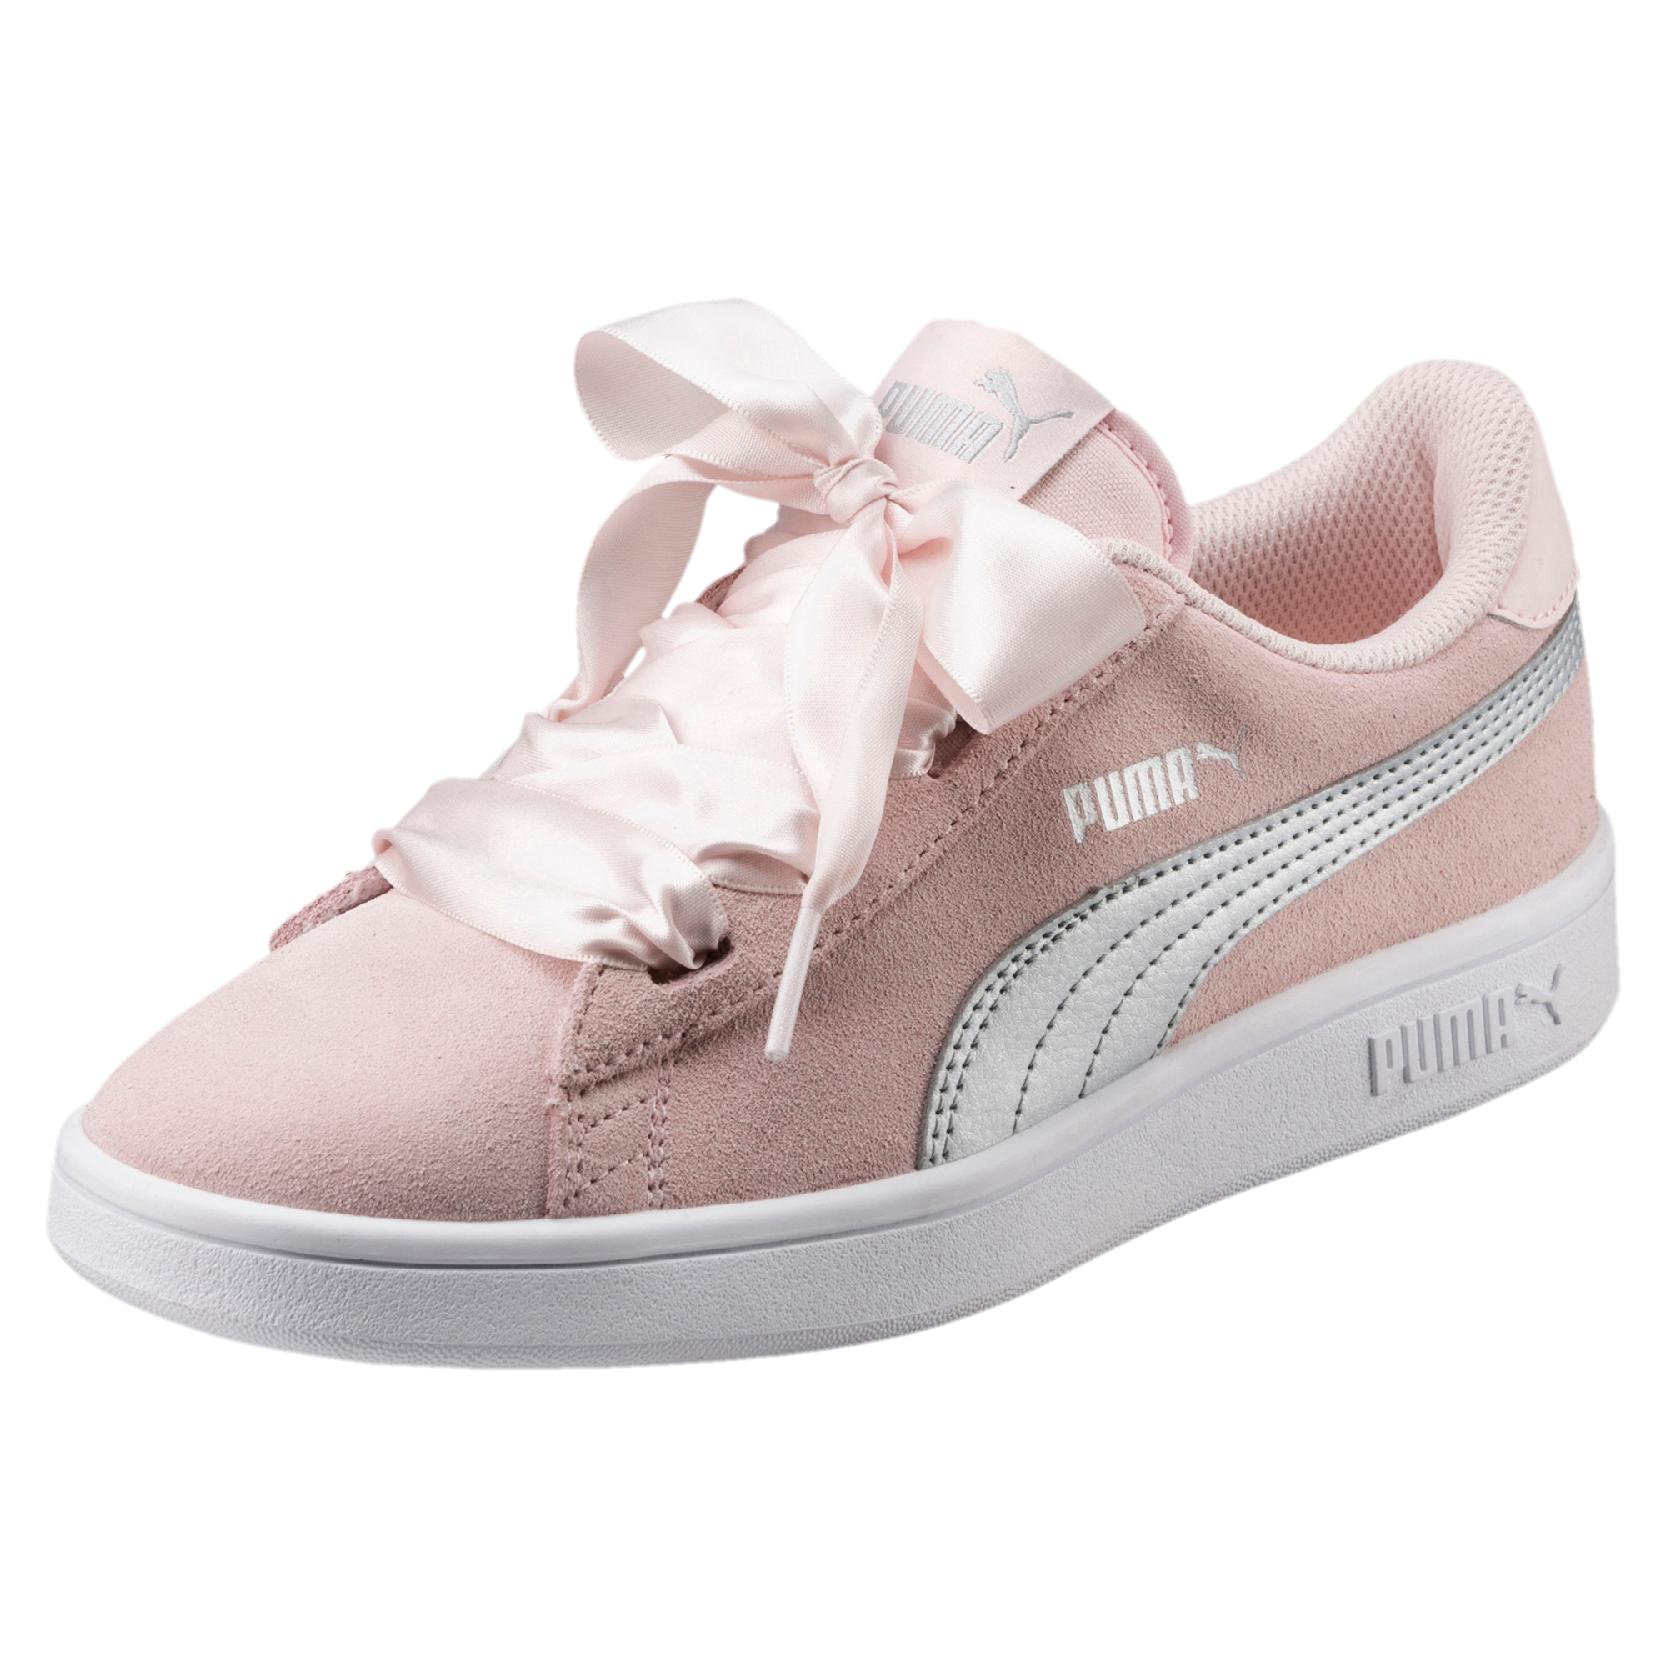 puma pour garçon chaussures baskets